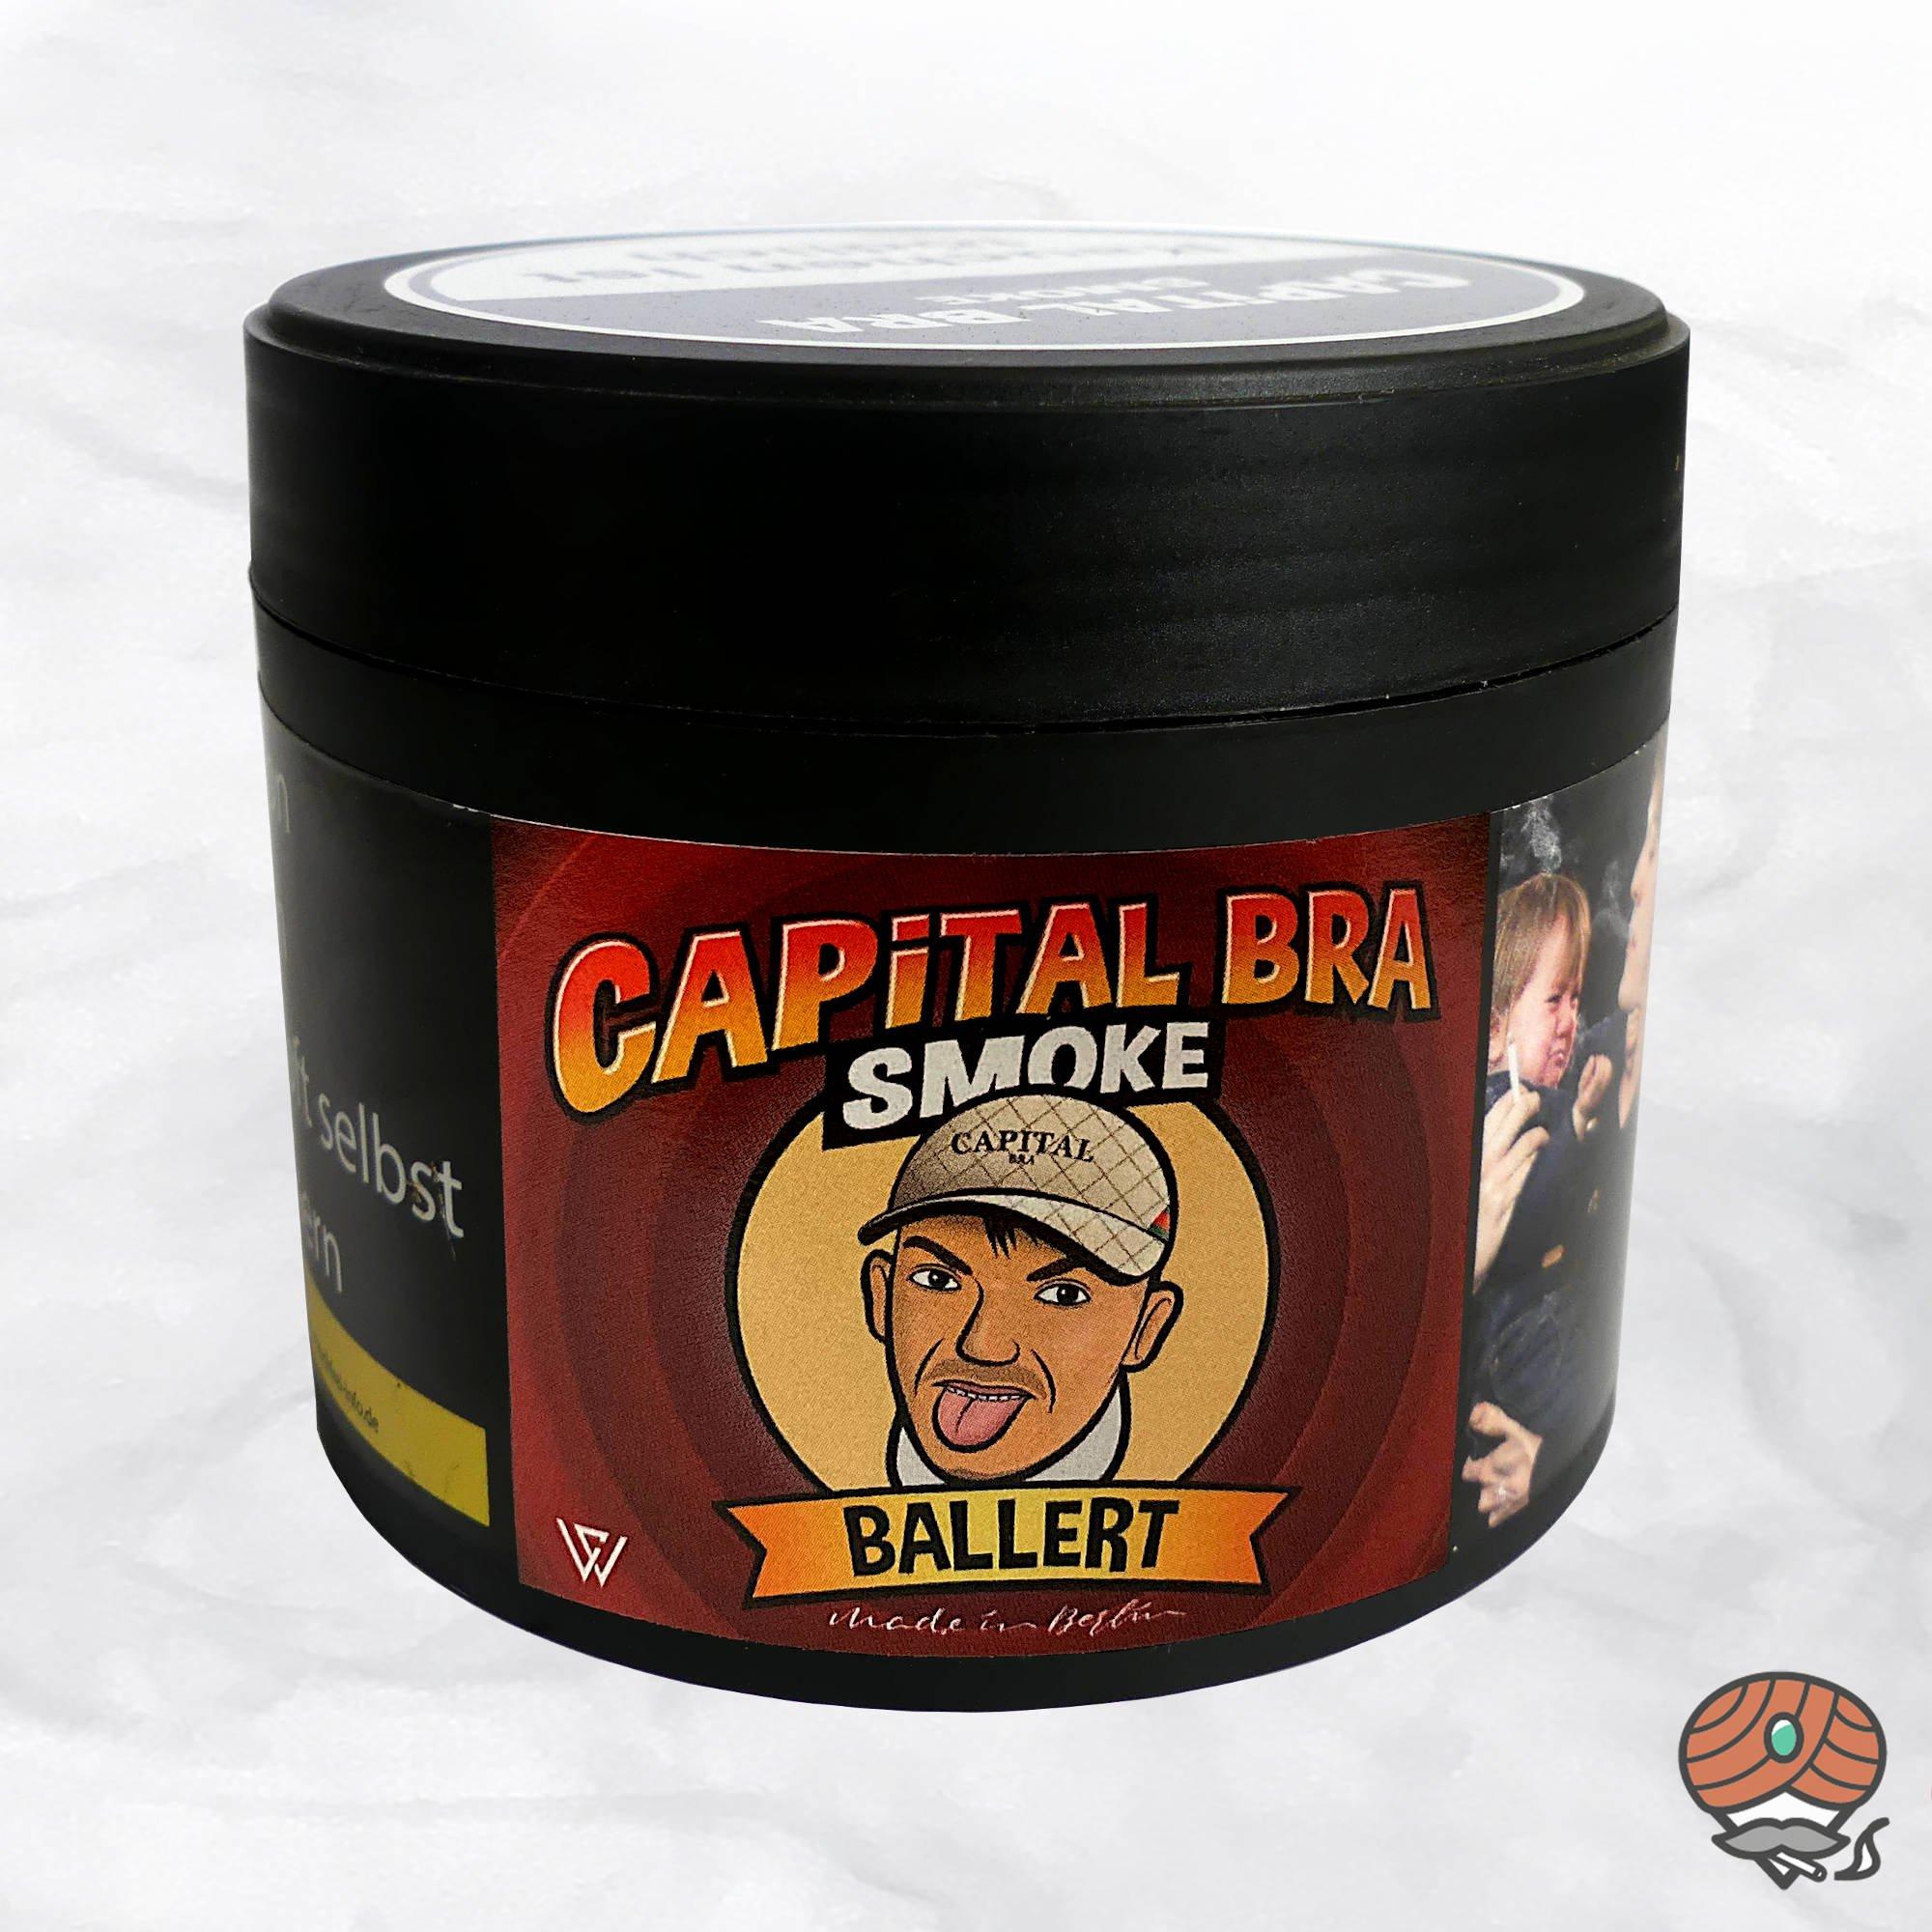 Capital Bra Smoke Shisha Tabak Ballert 200g